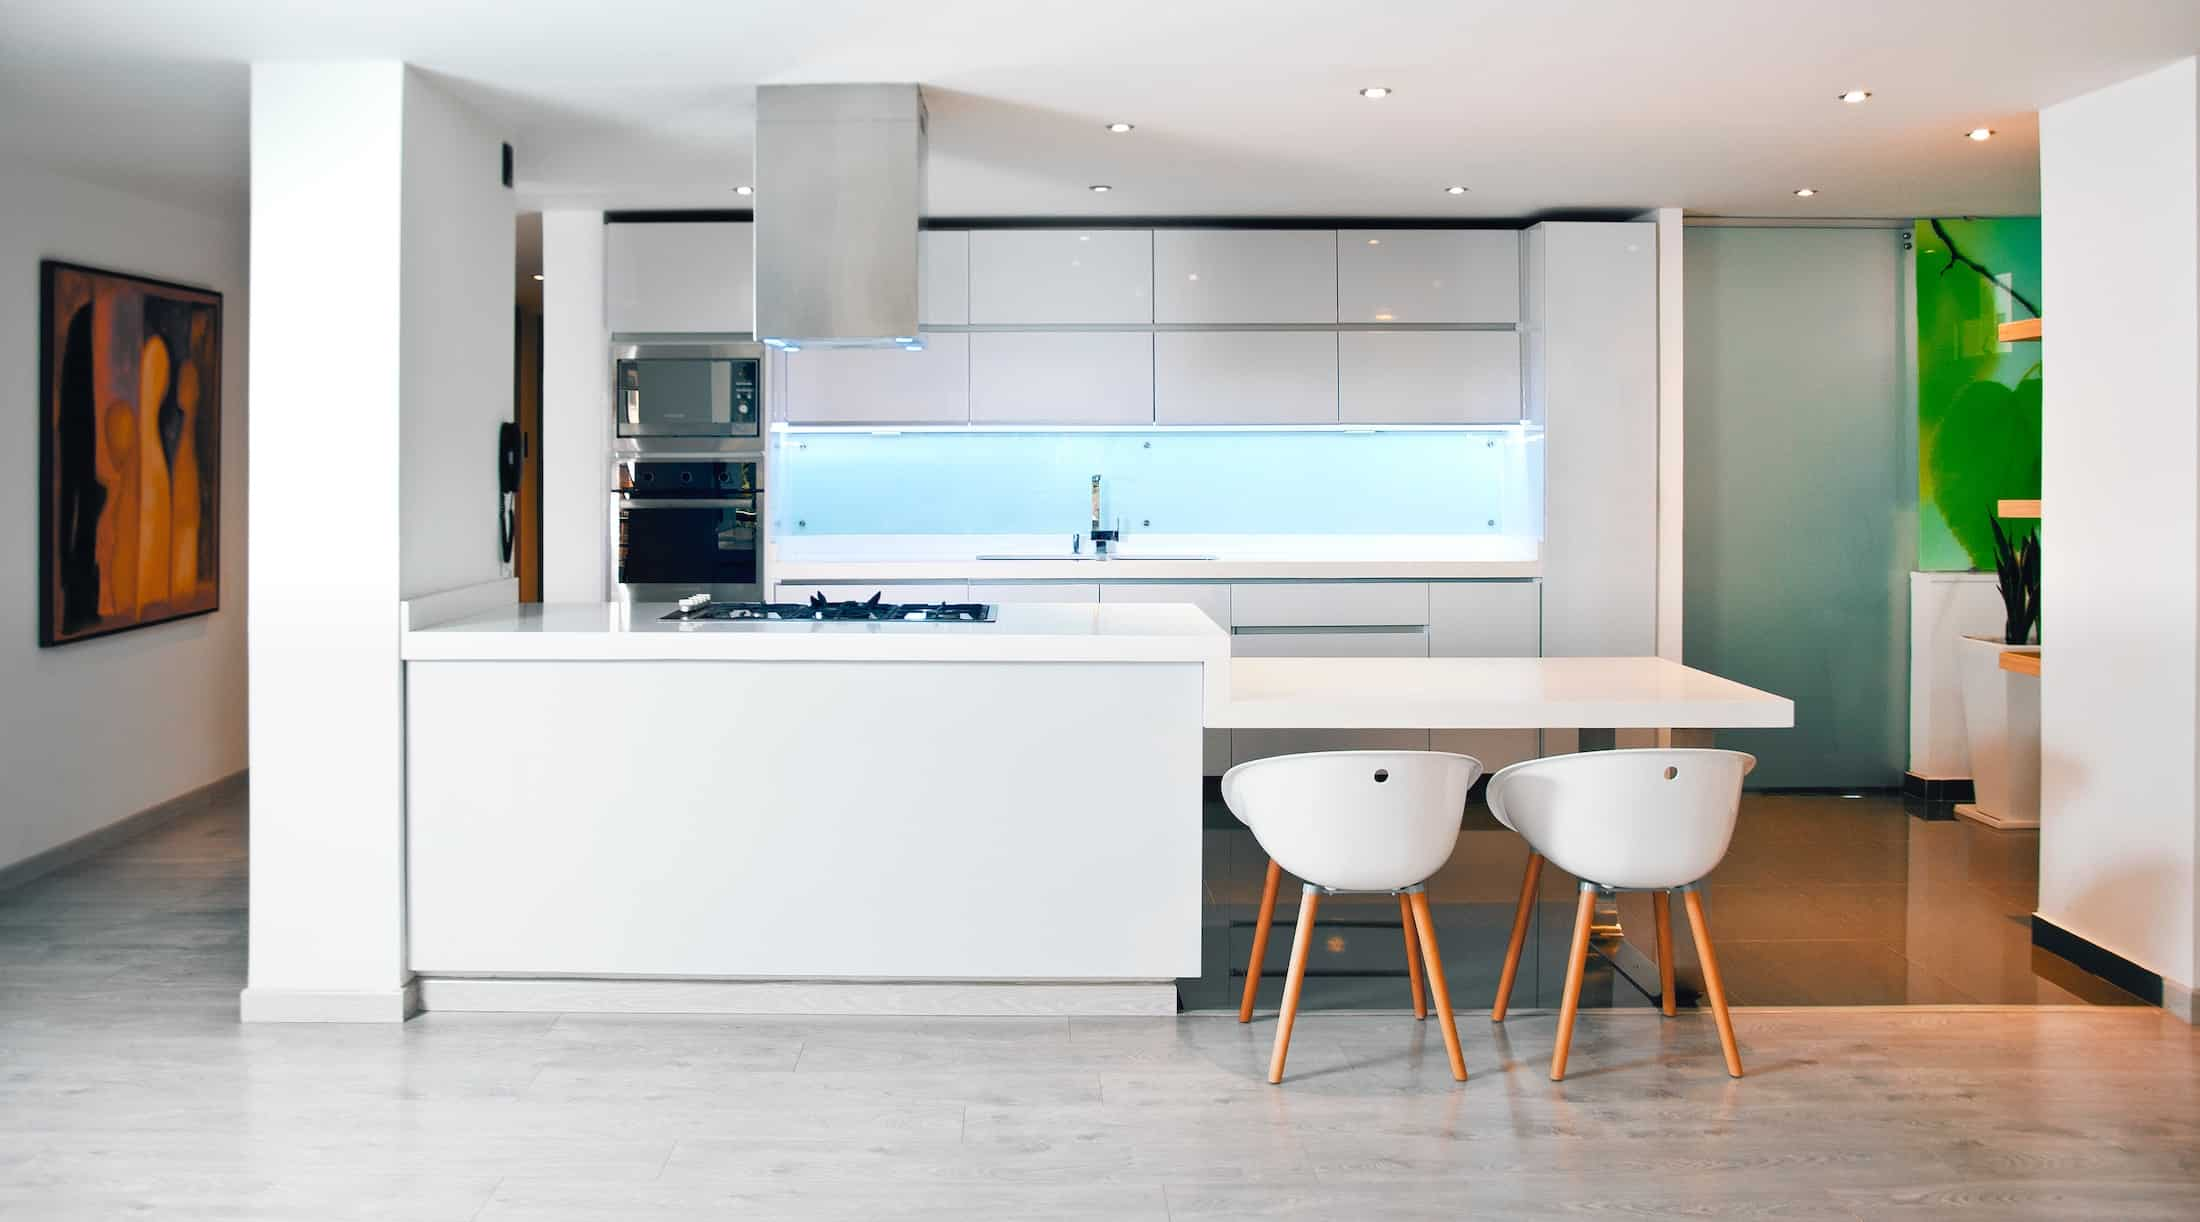 Improve rental kitchen